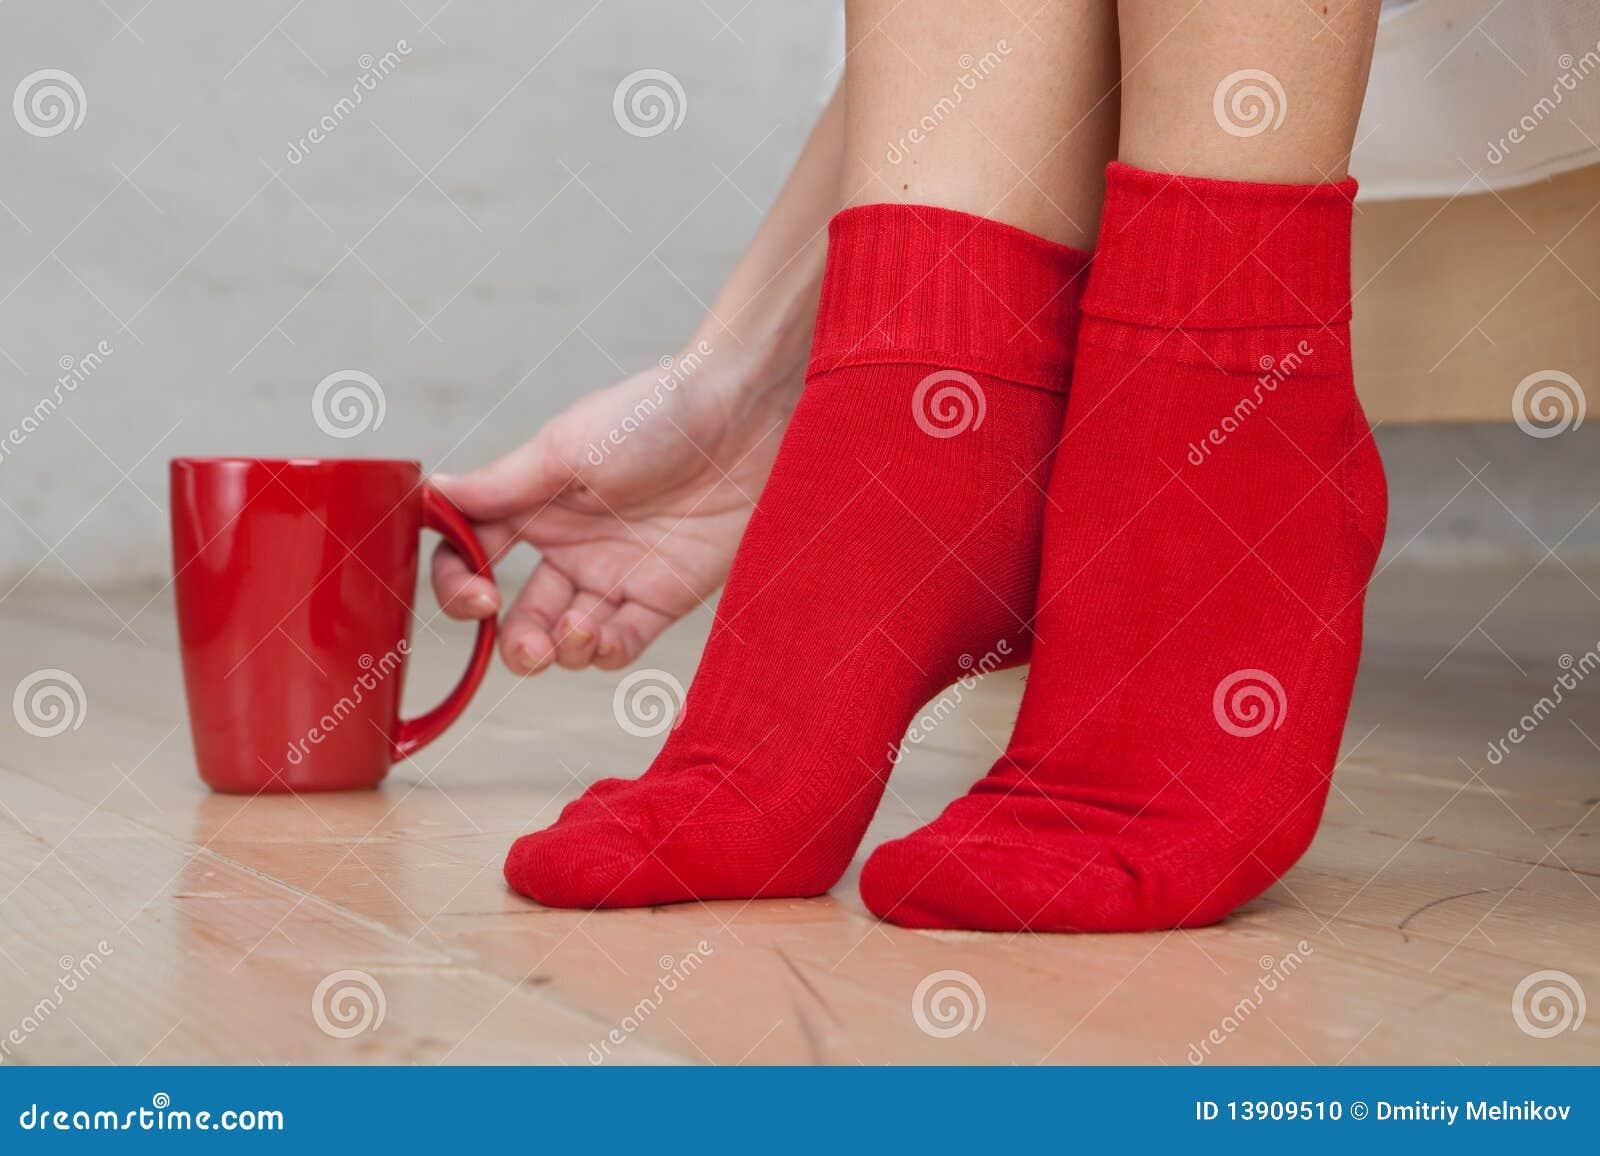 Фото женских ног носки 4 фотография